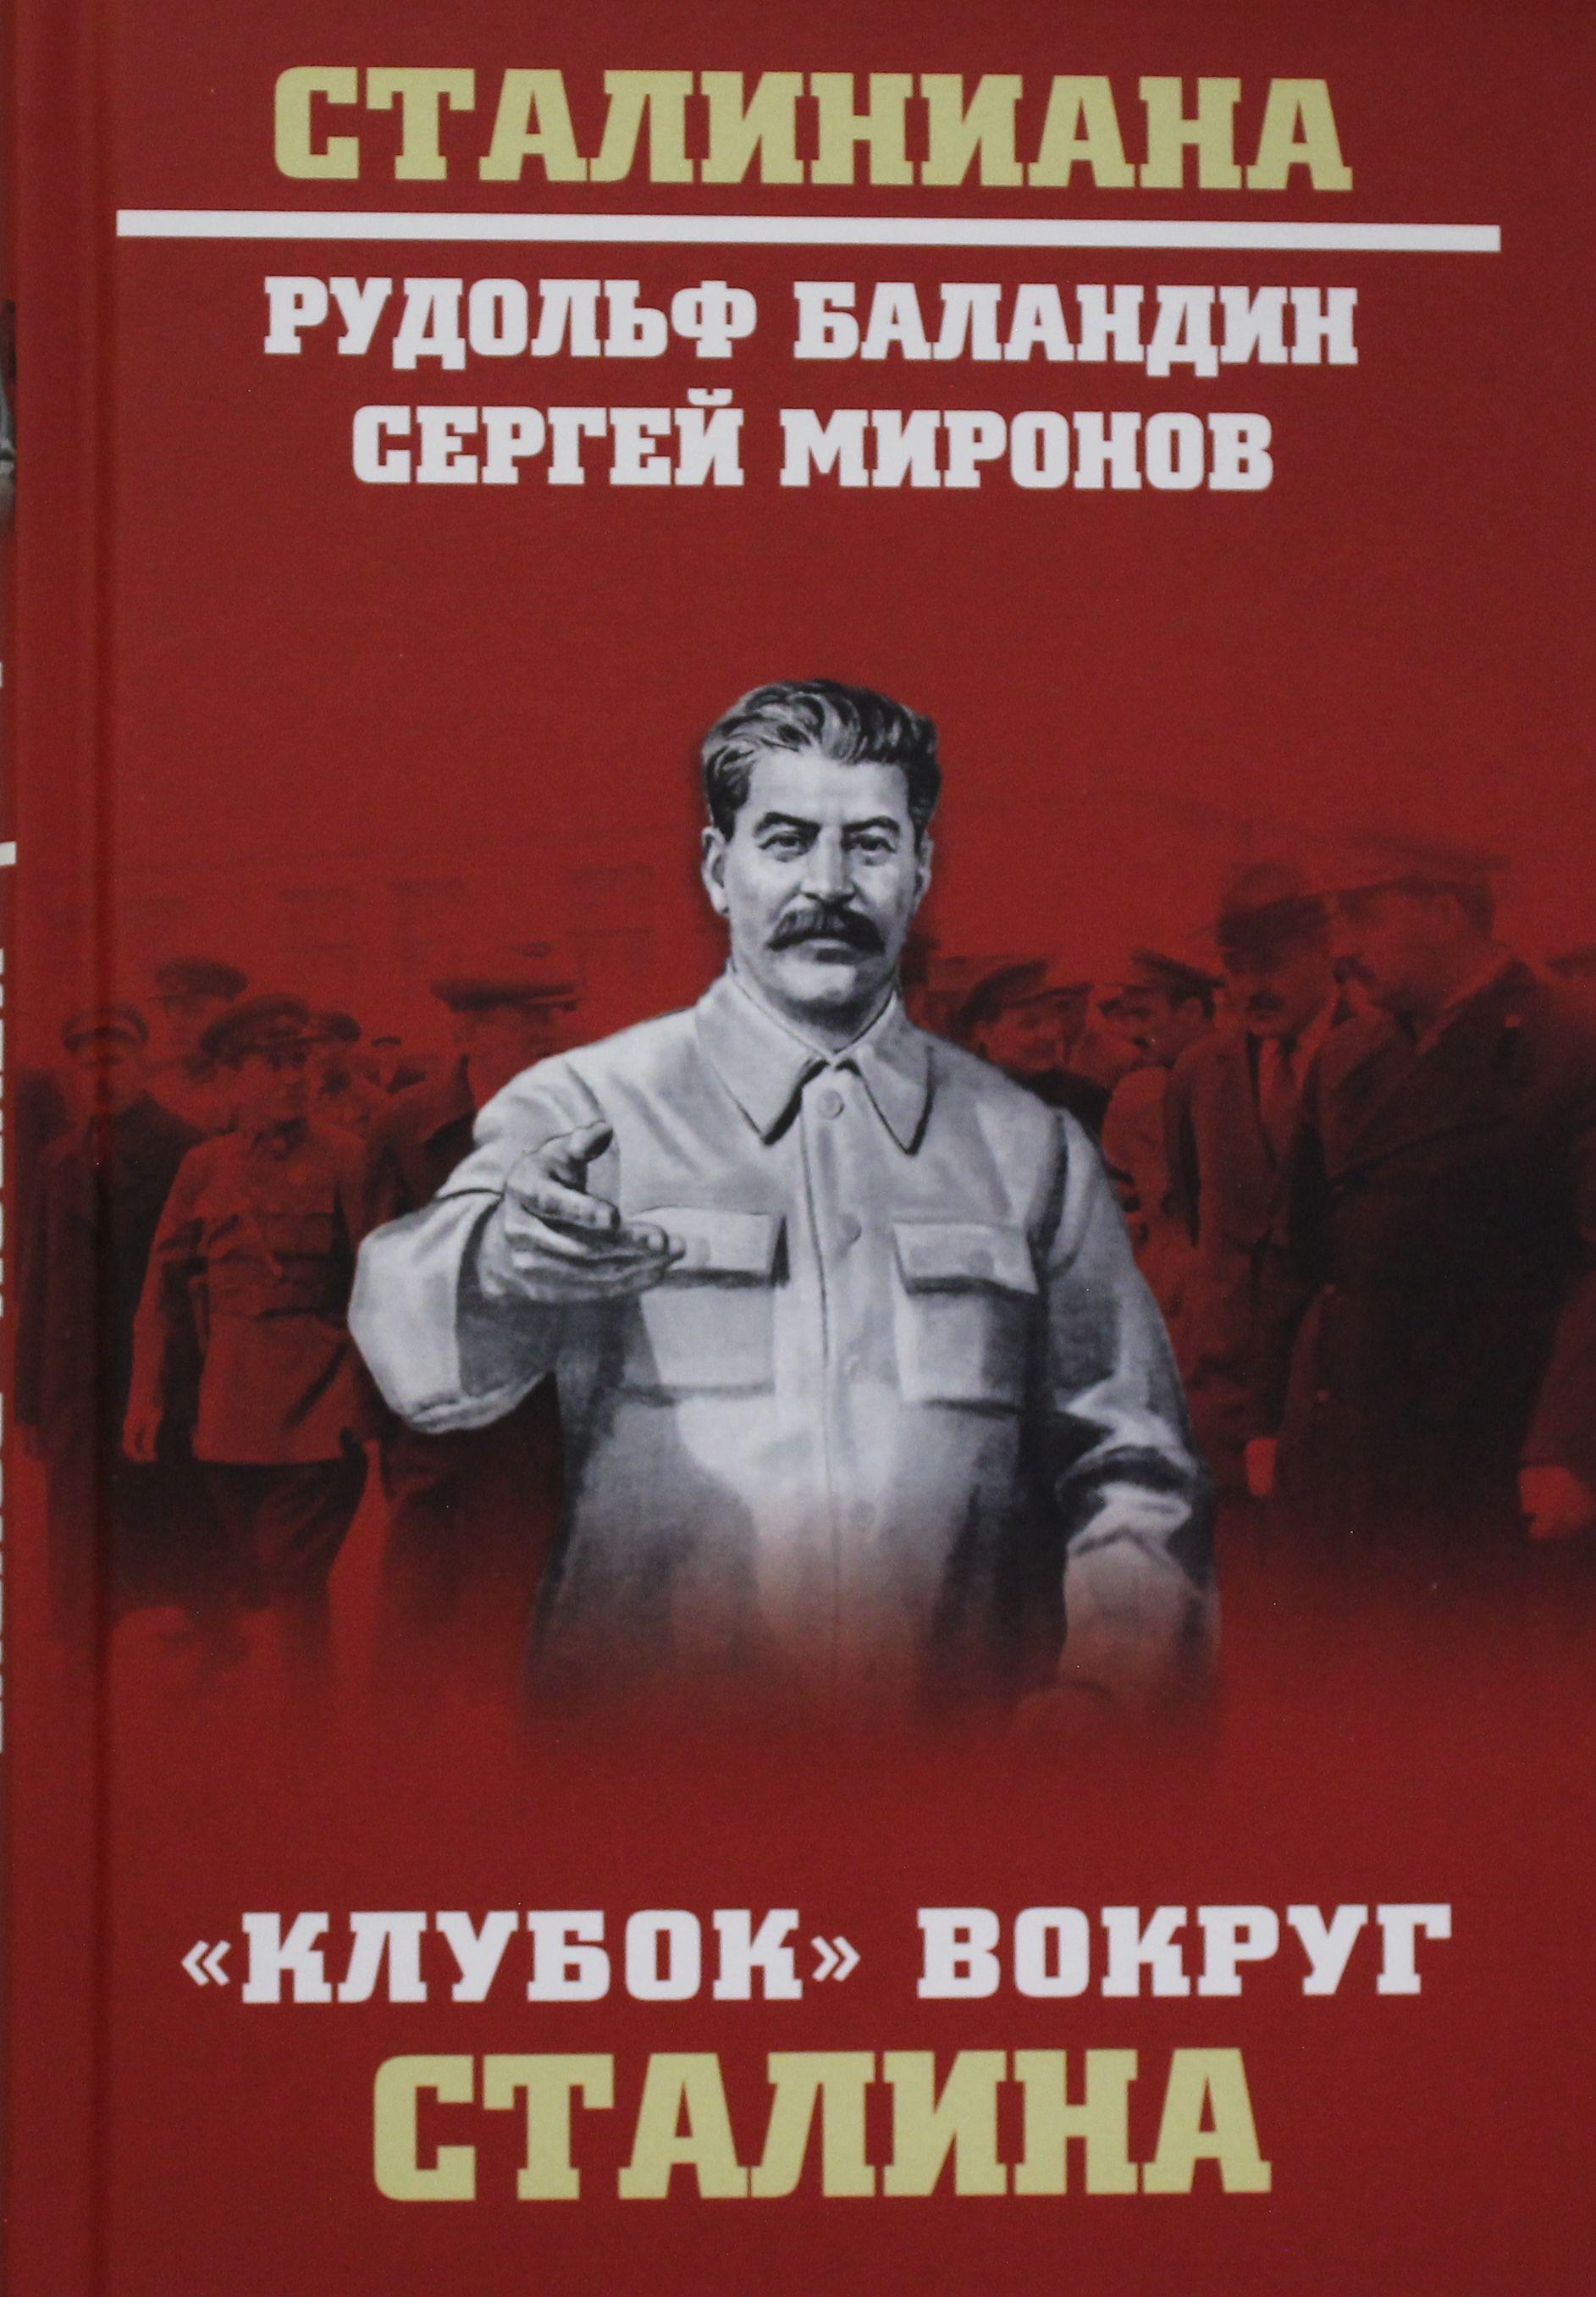 """Klubok"" vokrug Stalina"